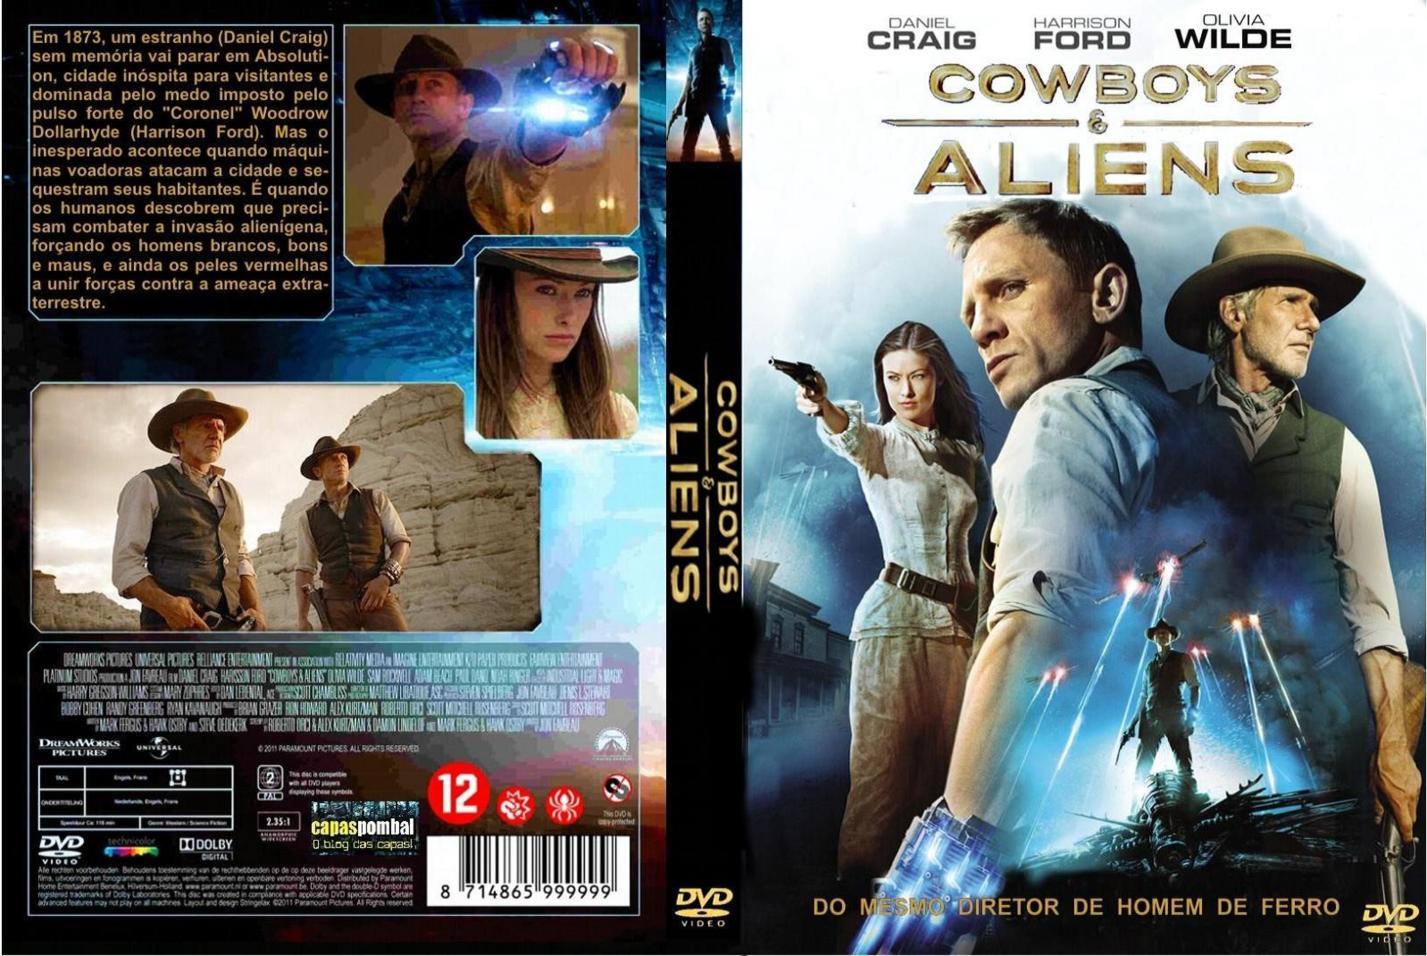 Kata filmes | download, filmes, rmvb, avi, filmes dublados.